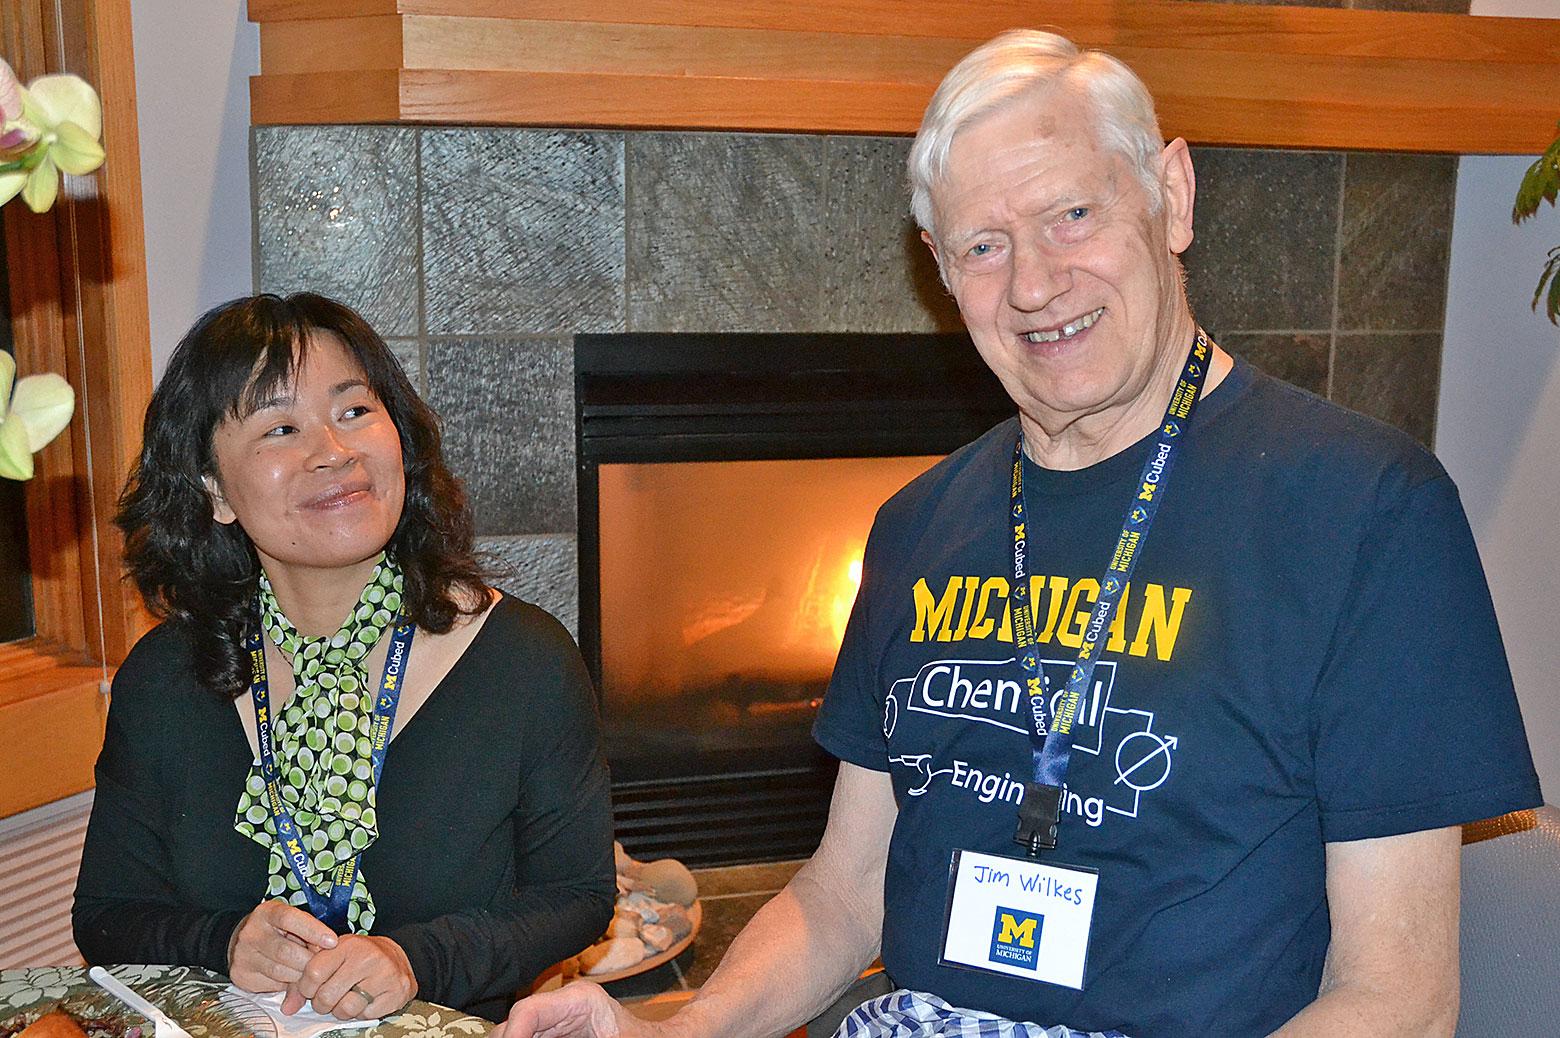 Jim Wilkes and Nina Lin